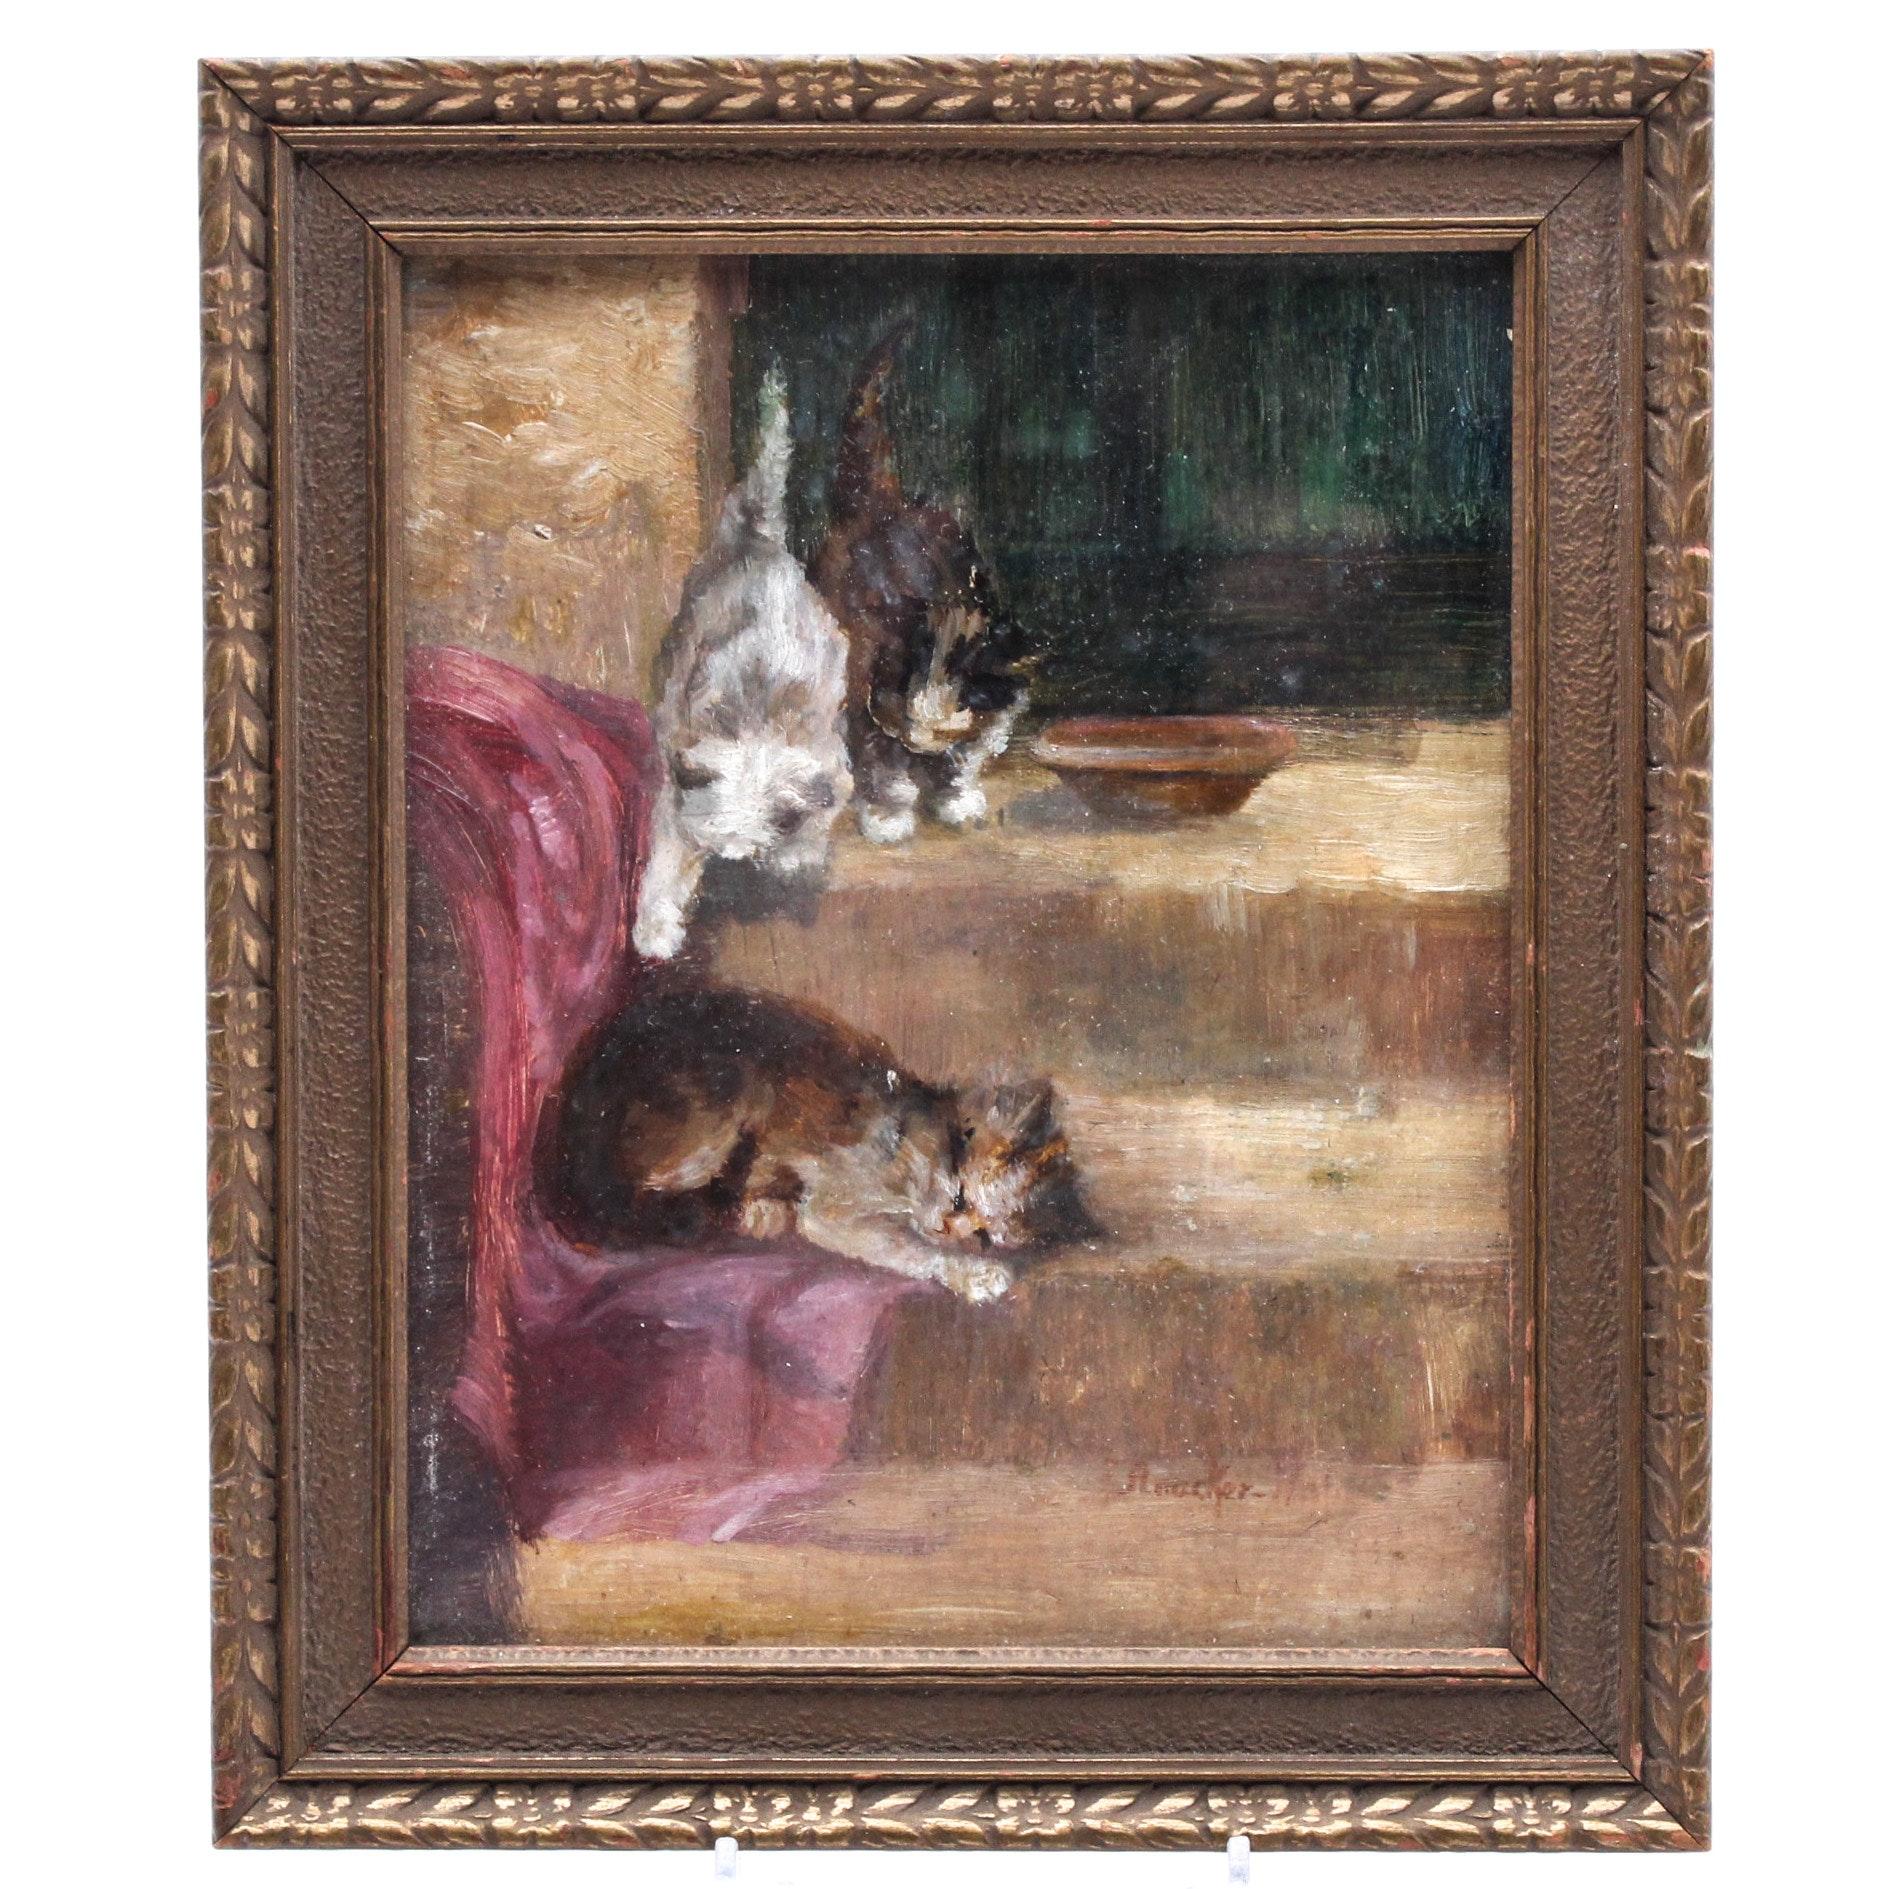 Oil Painting of Kittens